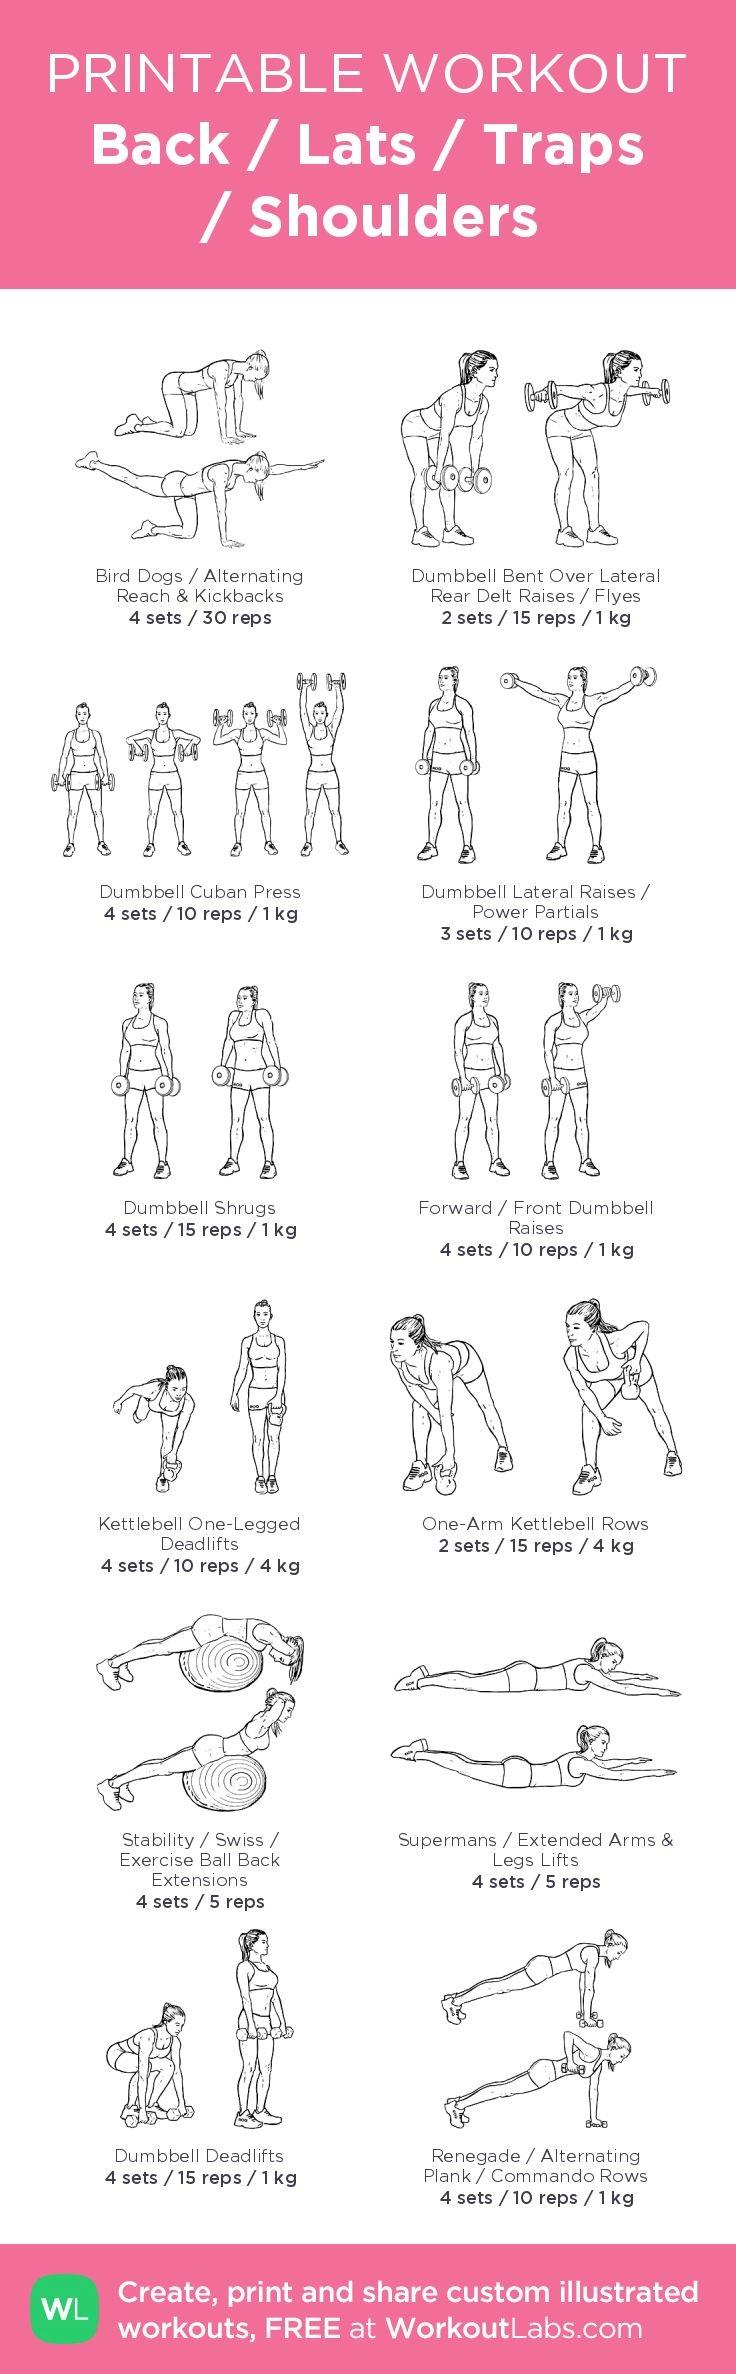 Pin by Faya Mostafa on Health | Fitness, Printable workouts